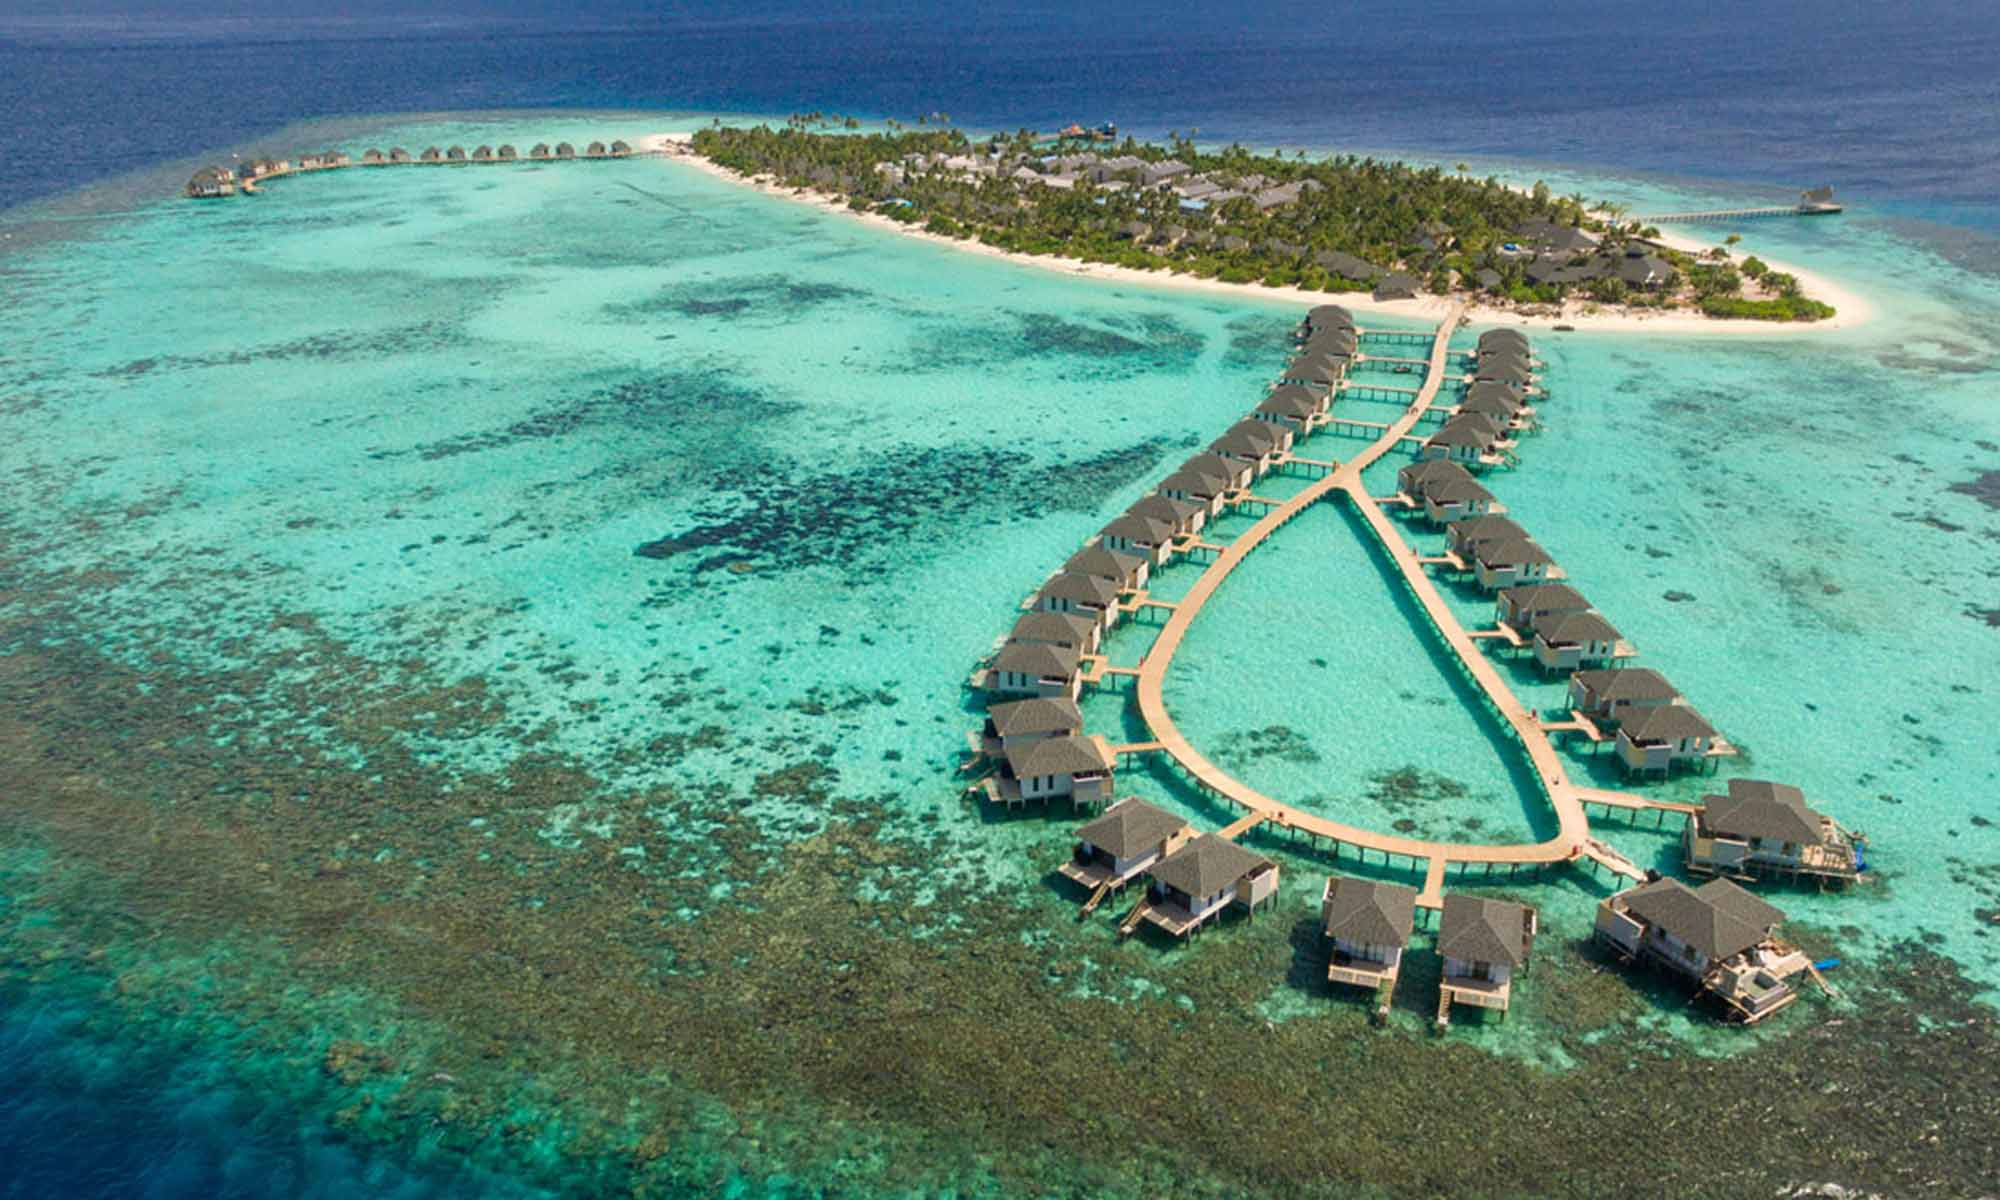 Slow Dive Indischer Ozean Malediven Euro Divers Amari Havodda Insel